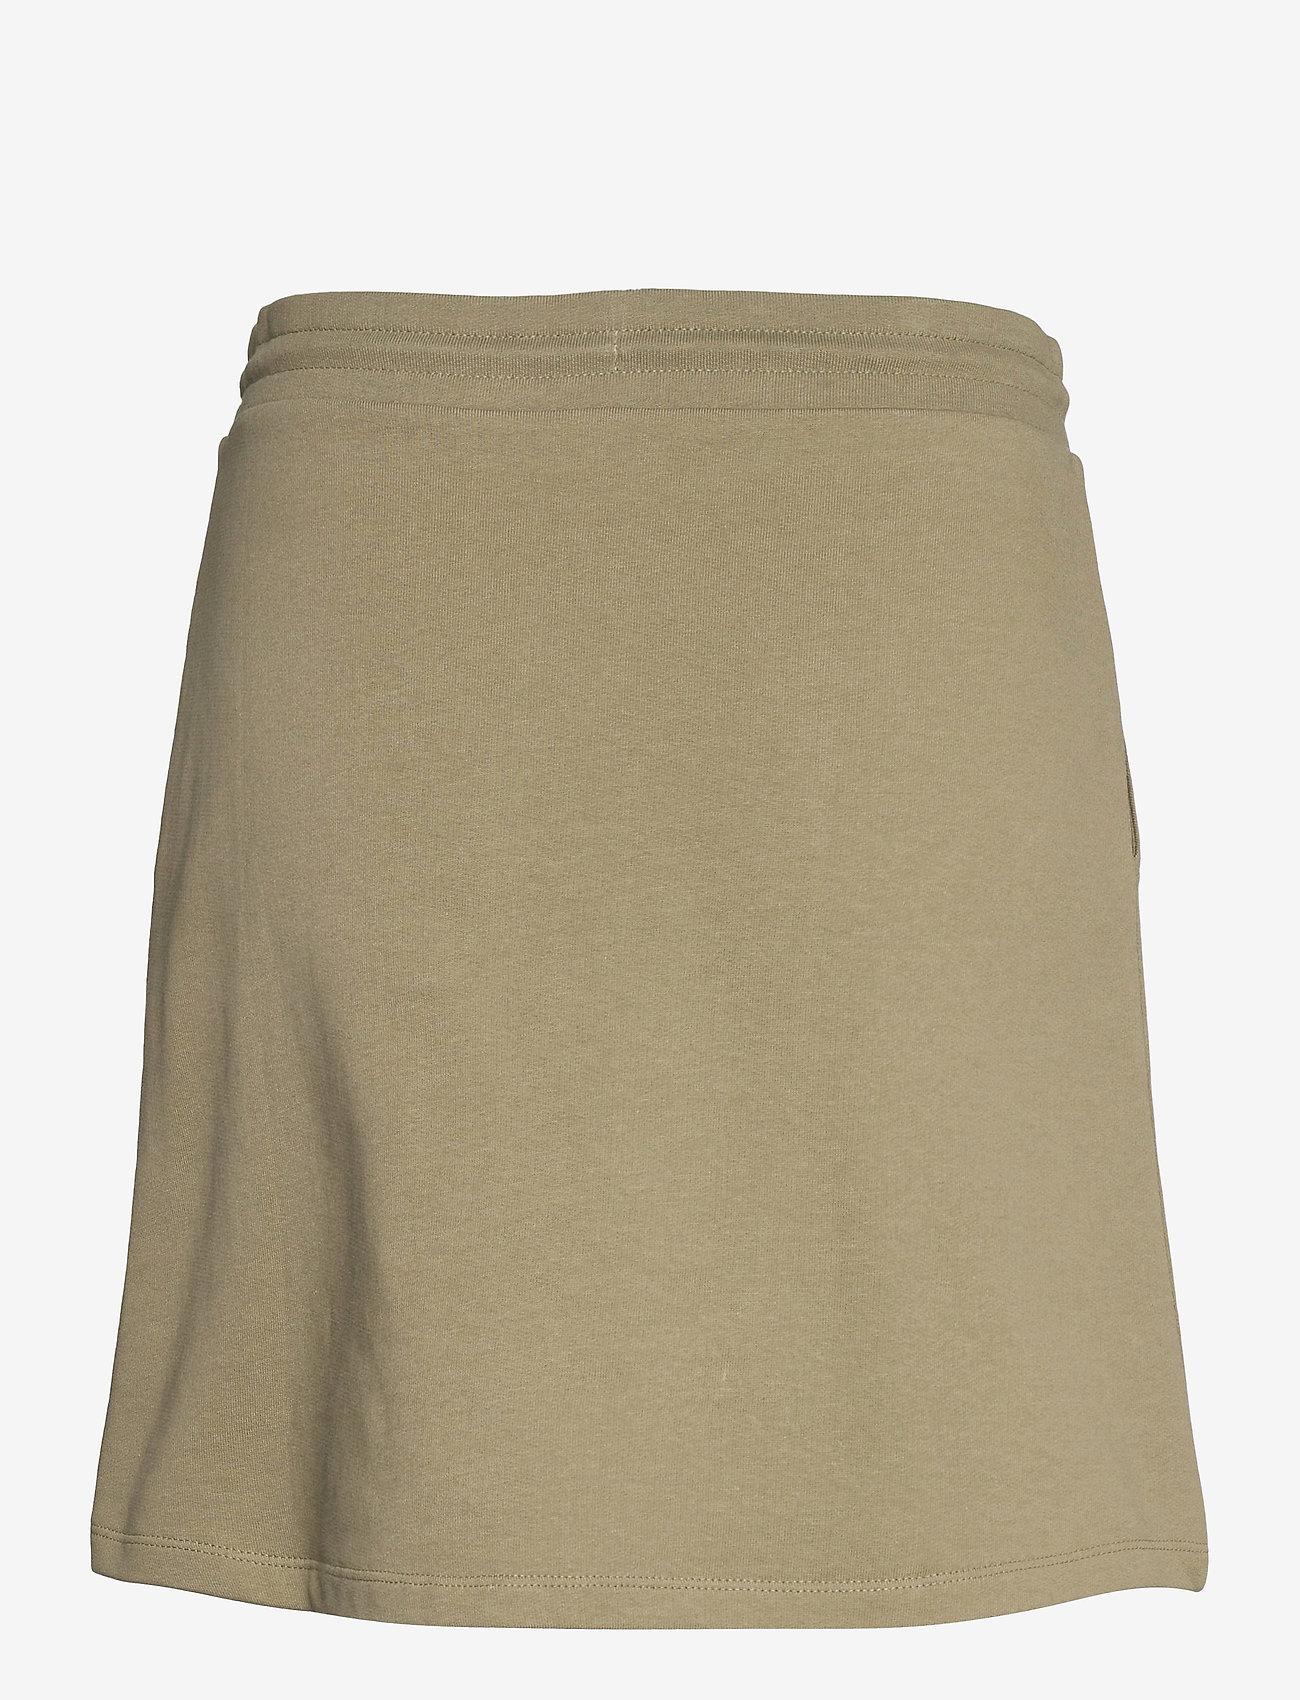 EDC by Esprit - Skirts knitted - korta kjolar - light khaki - 1